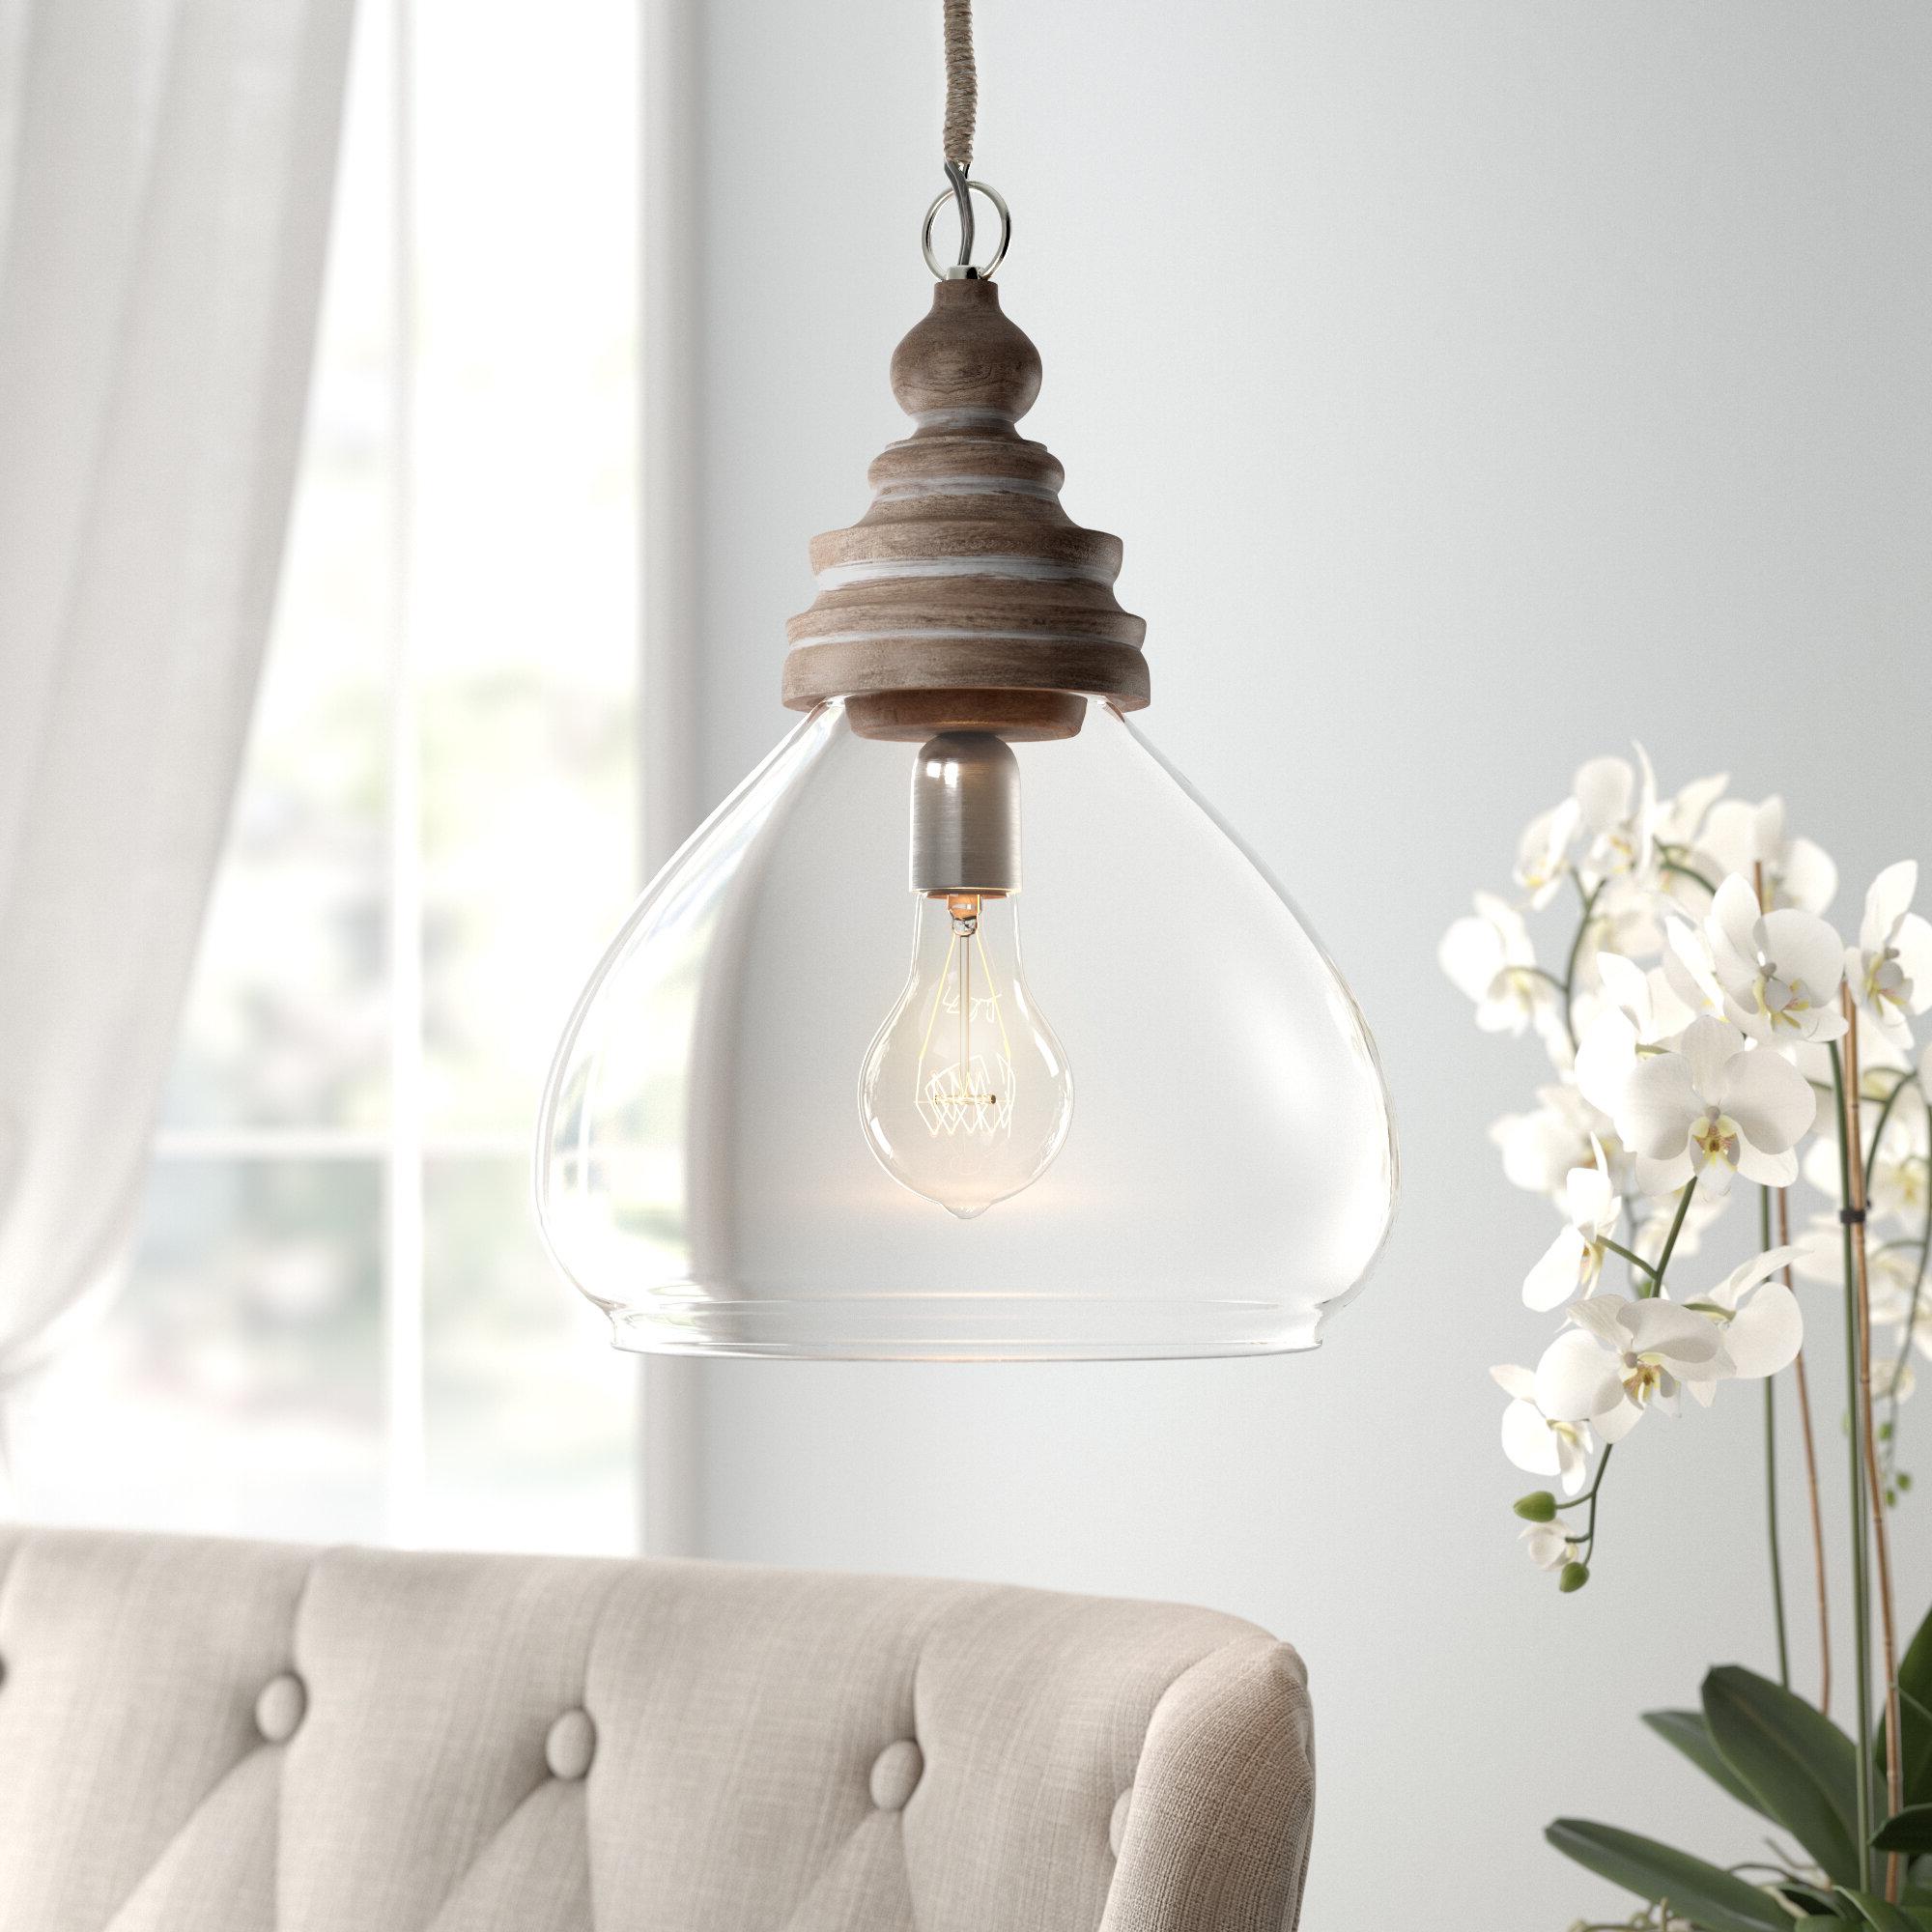 Brisa 1-Light Single Dome Pendant regarding Best and Newest Abordale 1-Light Single Dome Pendants